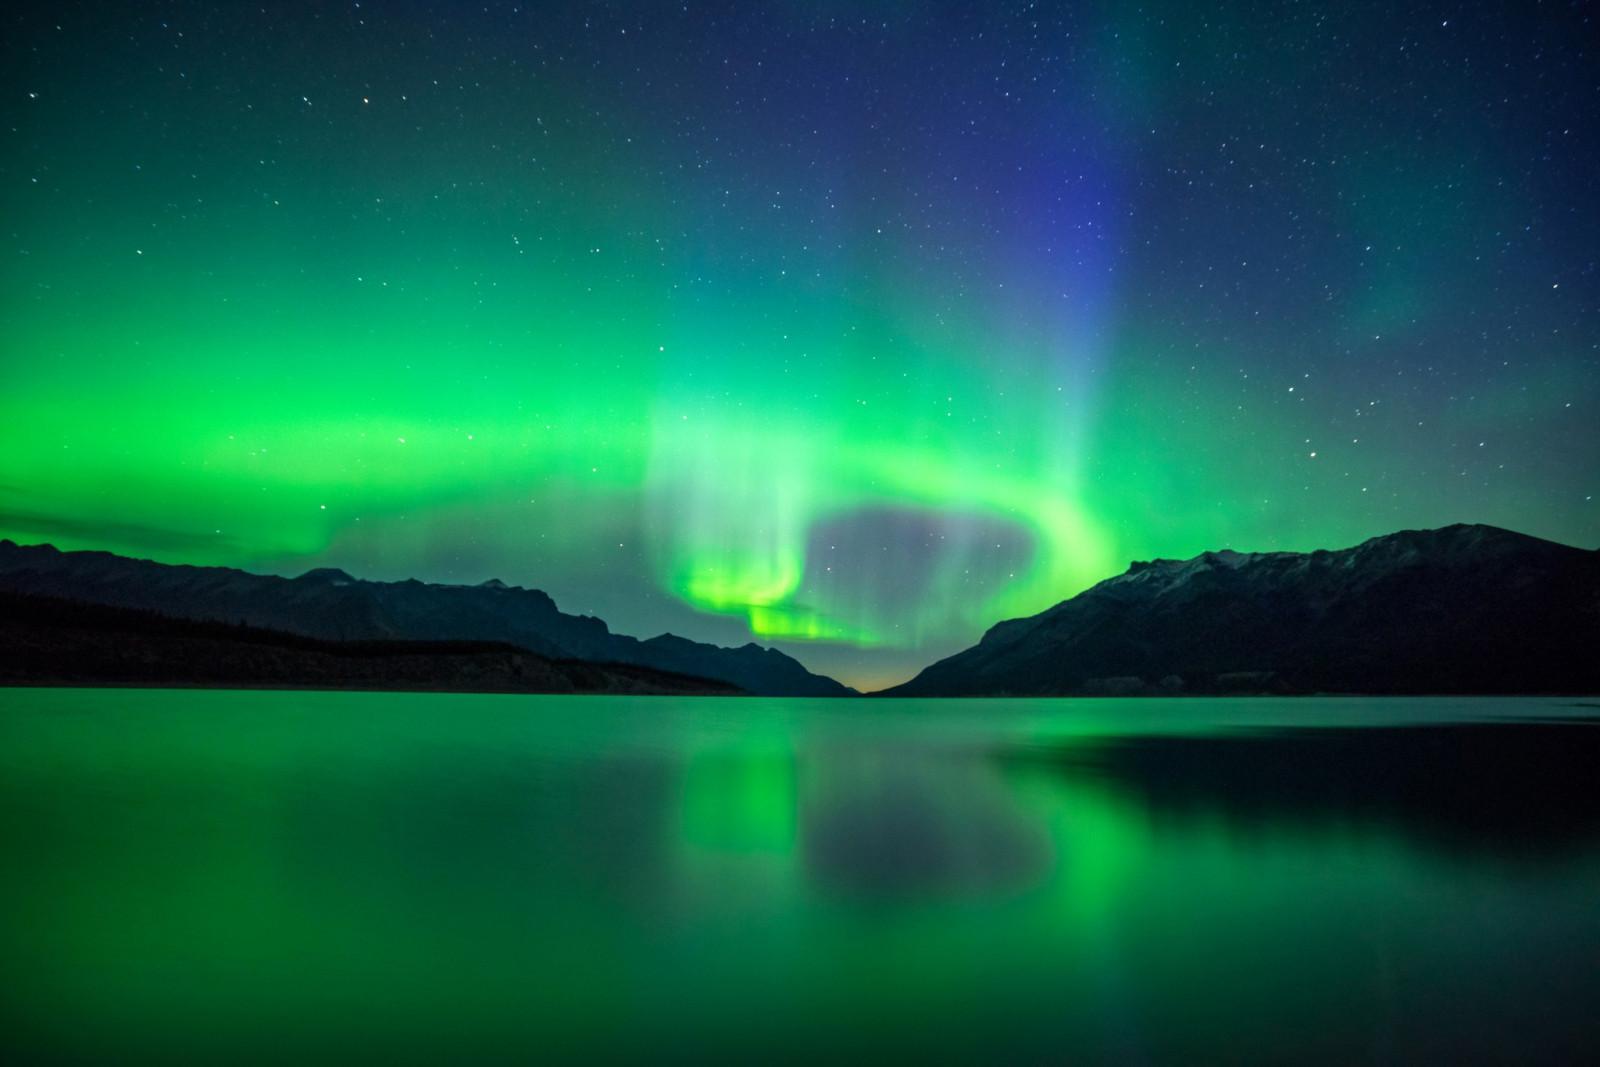 Landscape Mountains Night Lake Reflection Nebula Atmosphere Canada Alberta Aurora Light